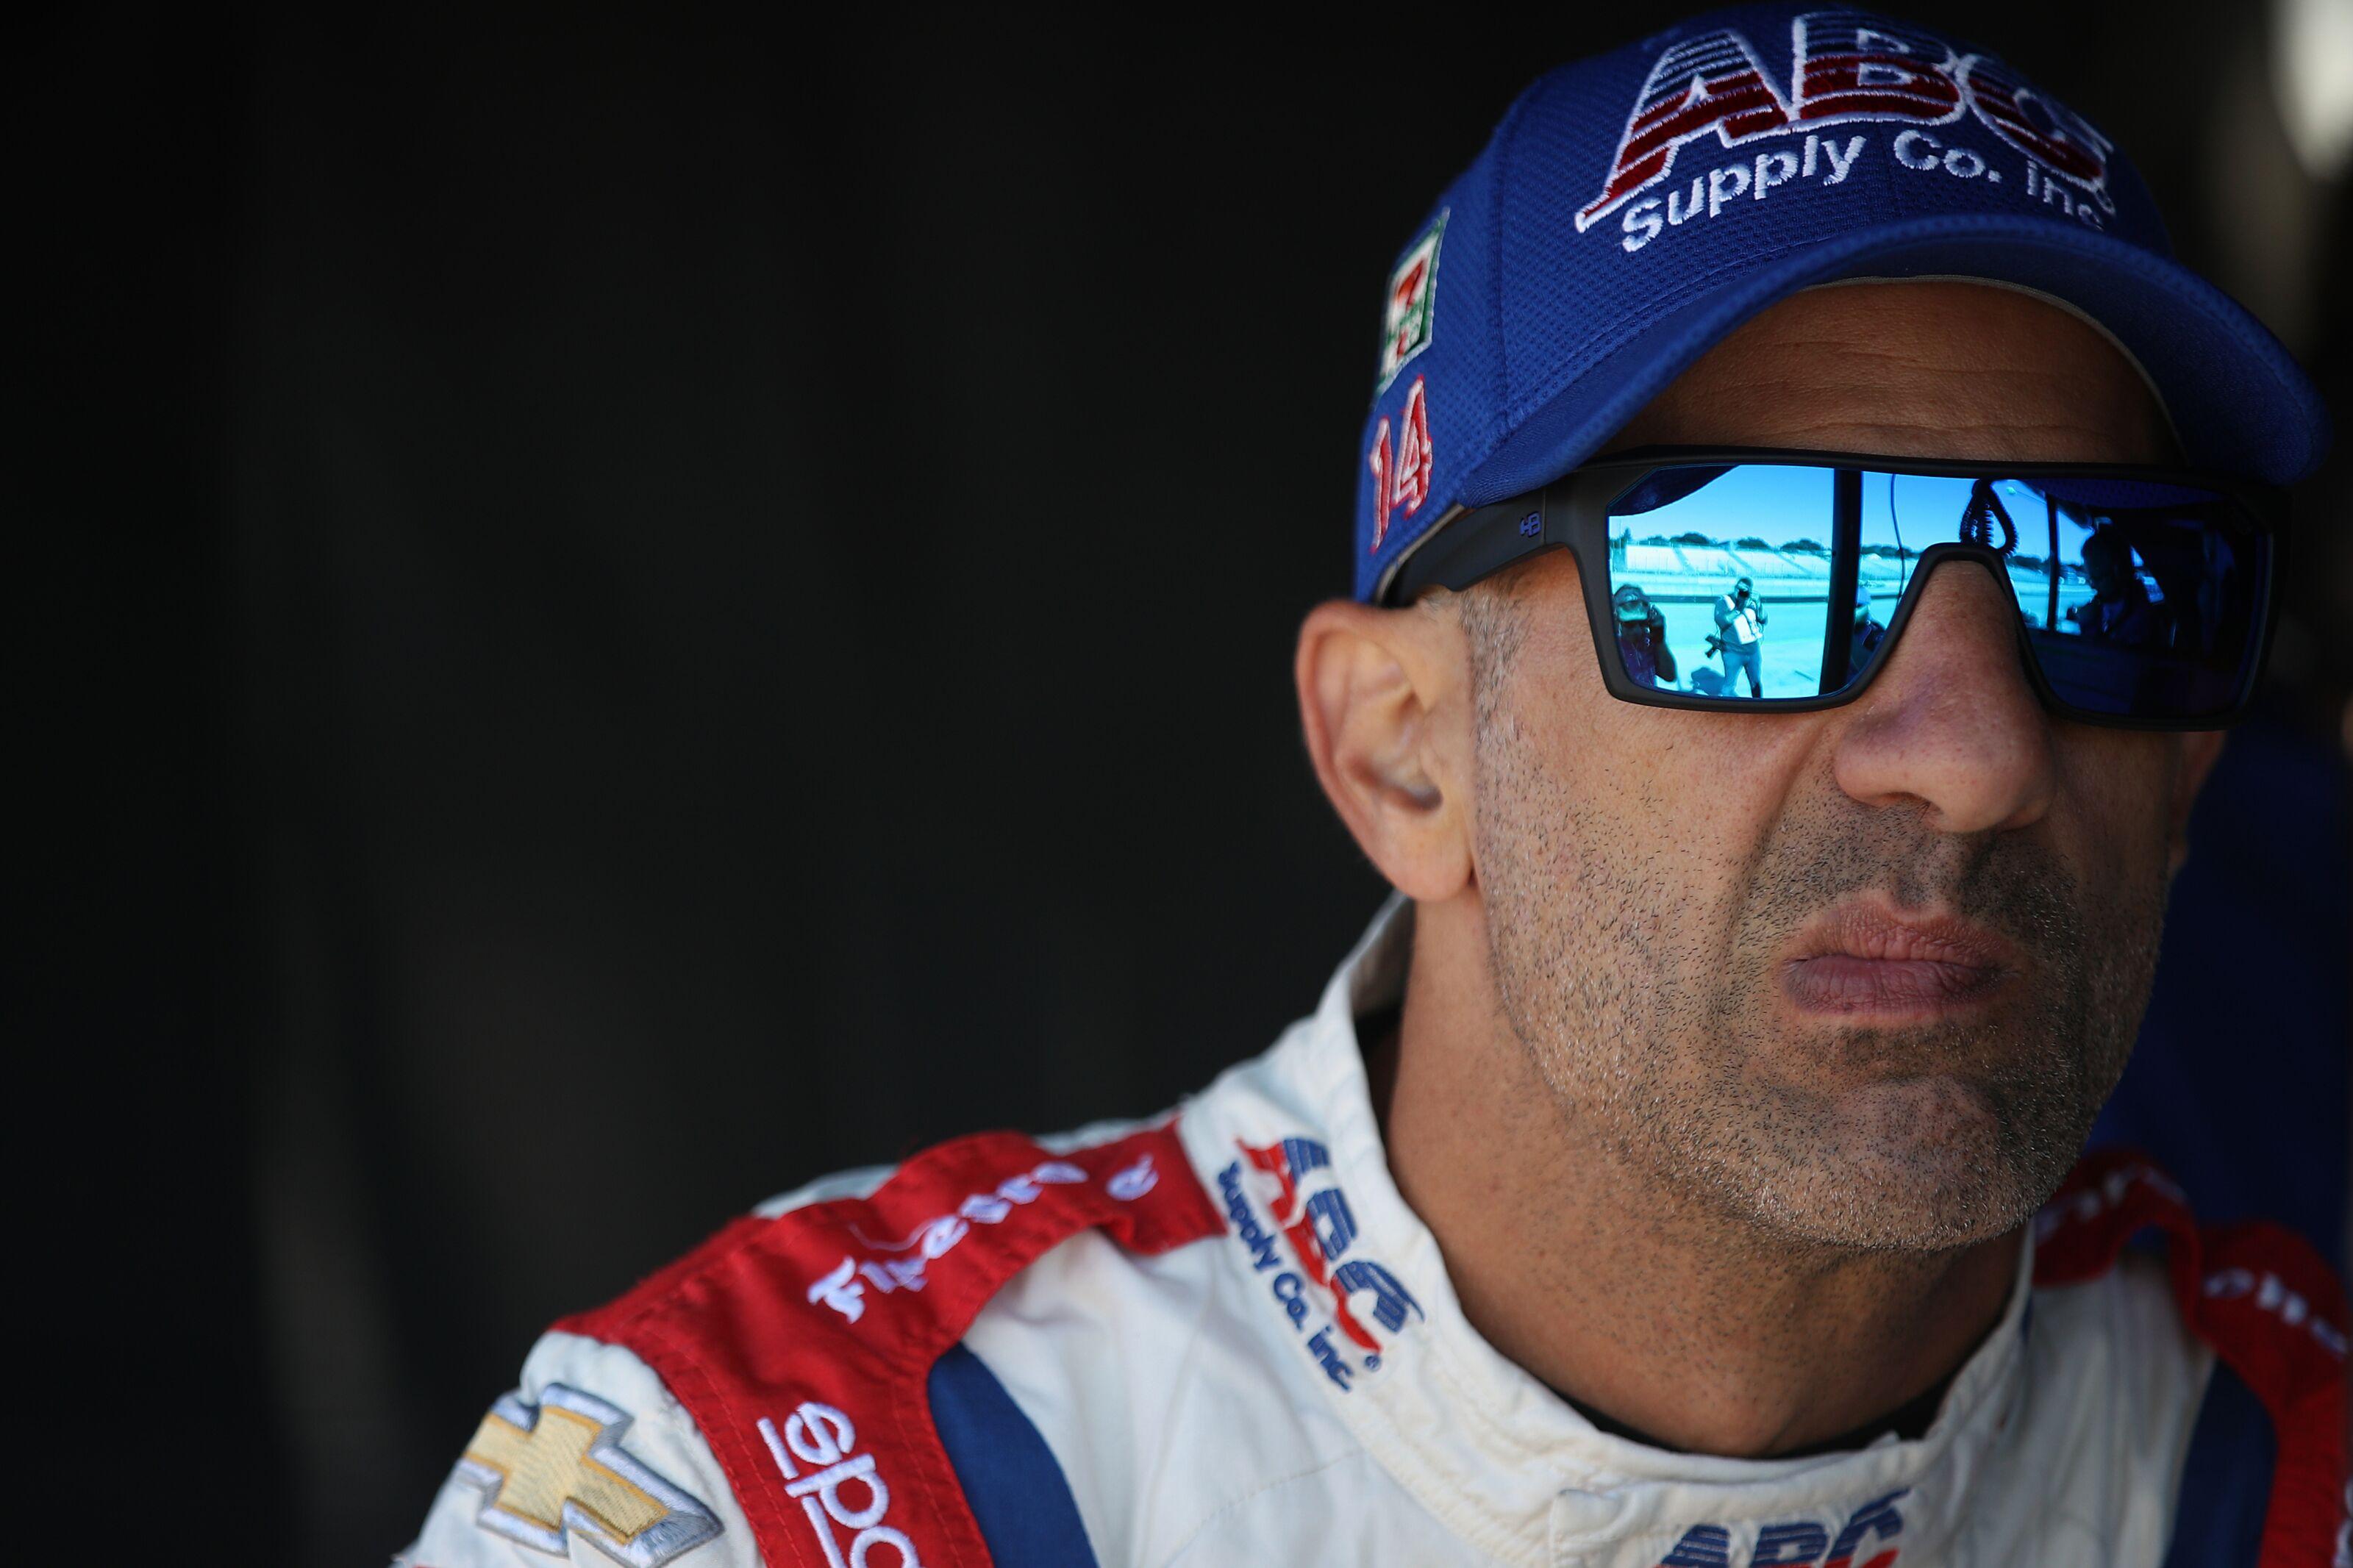 IndyCar: Tony Kanaan slated to return to A.J. Foyt Enterprises in 2020